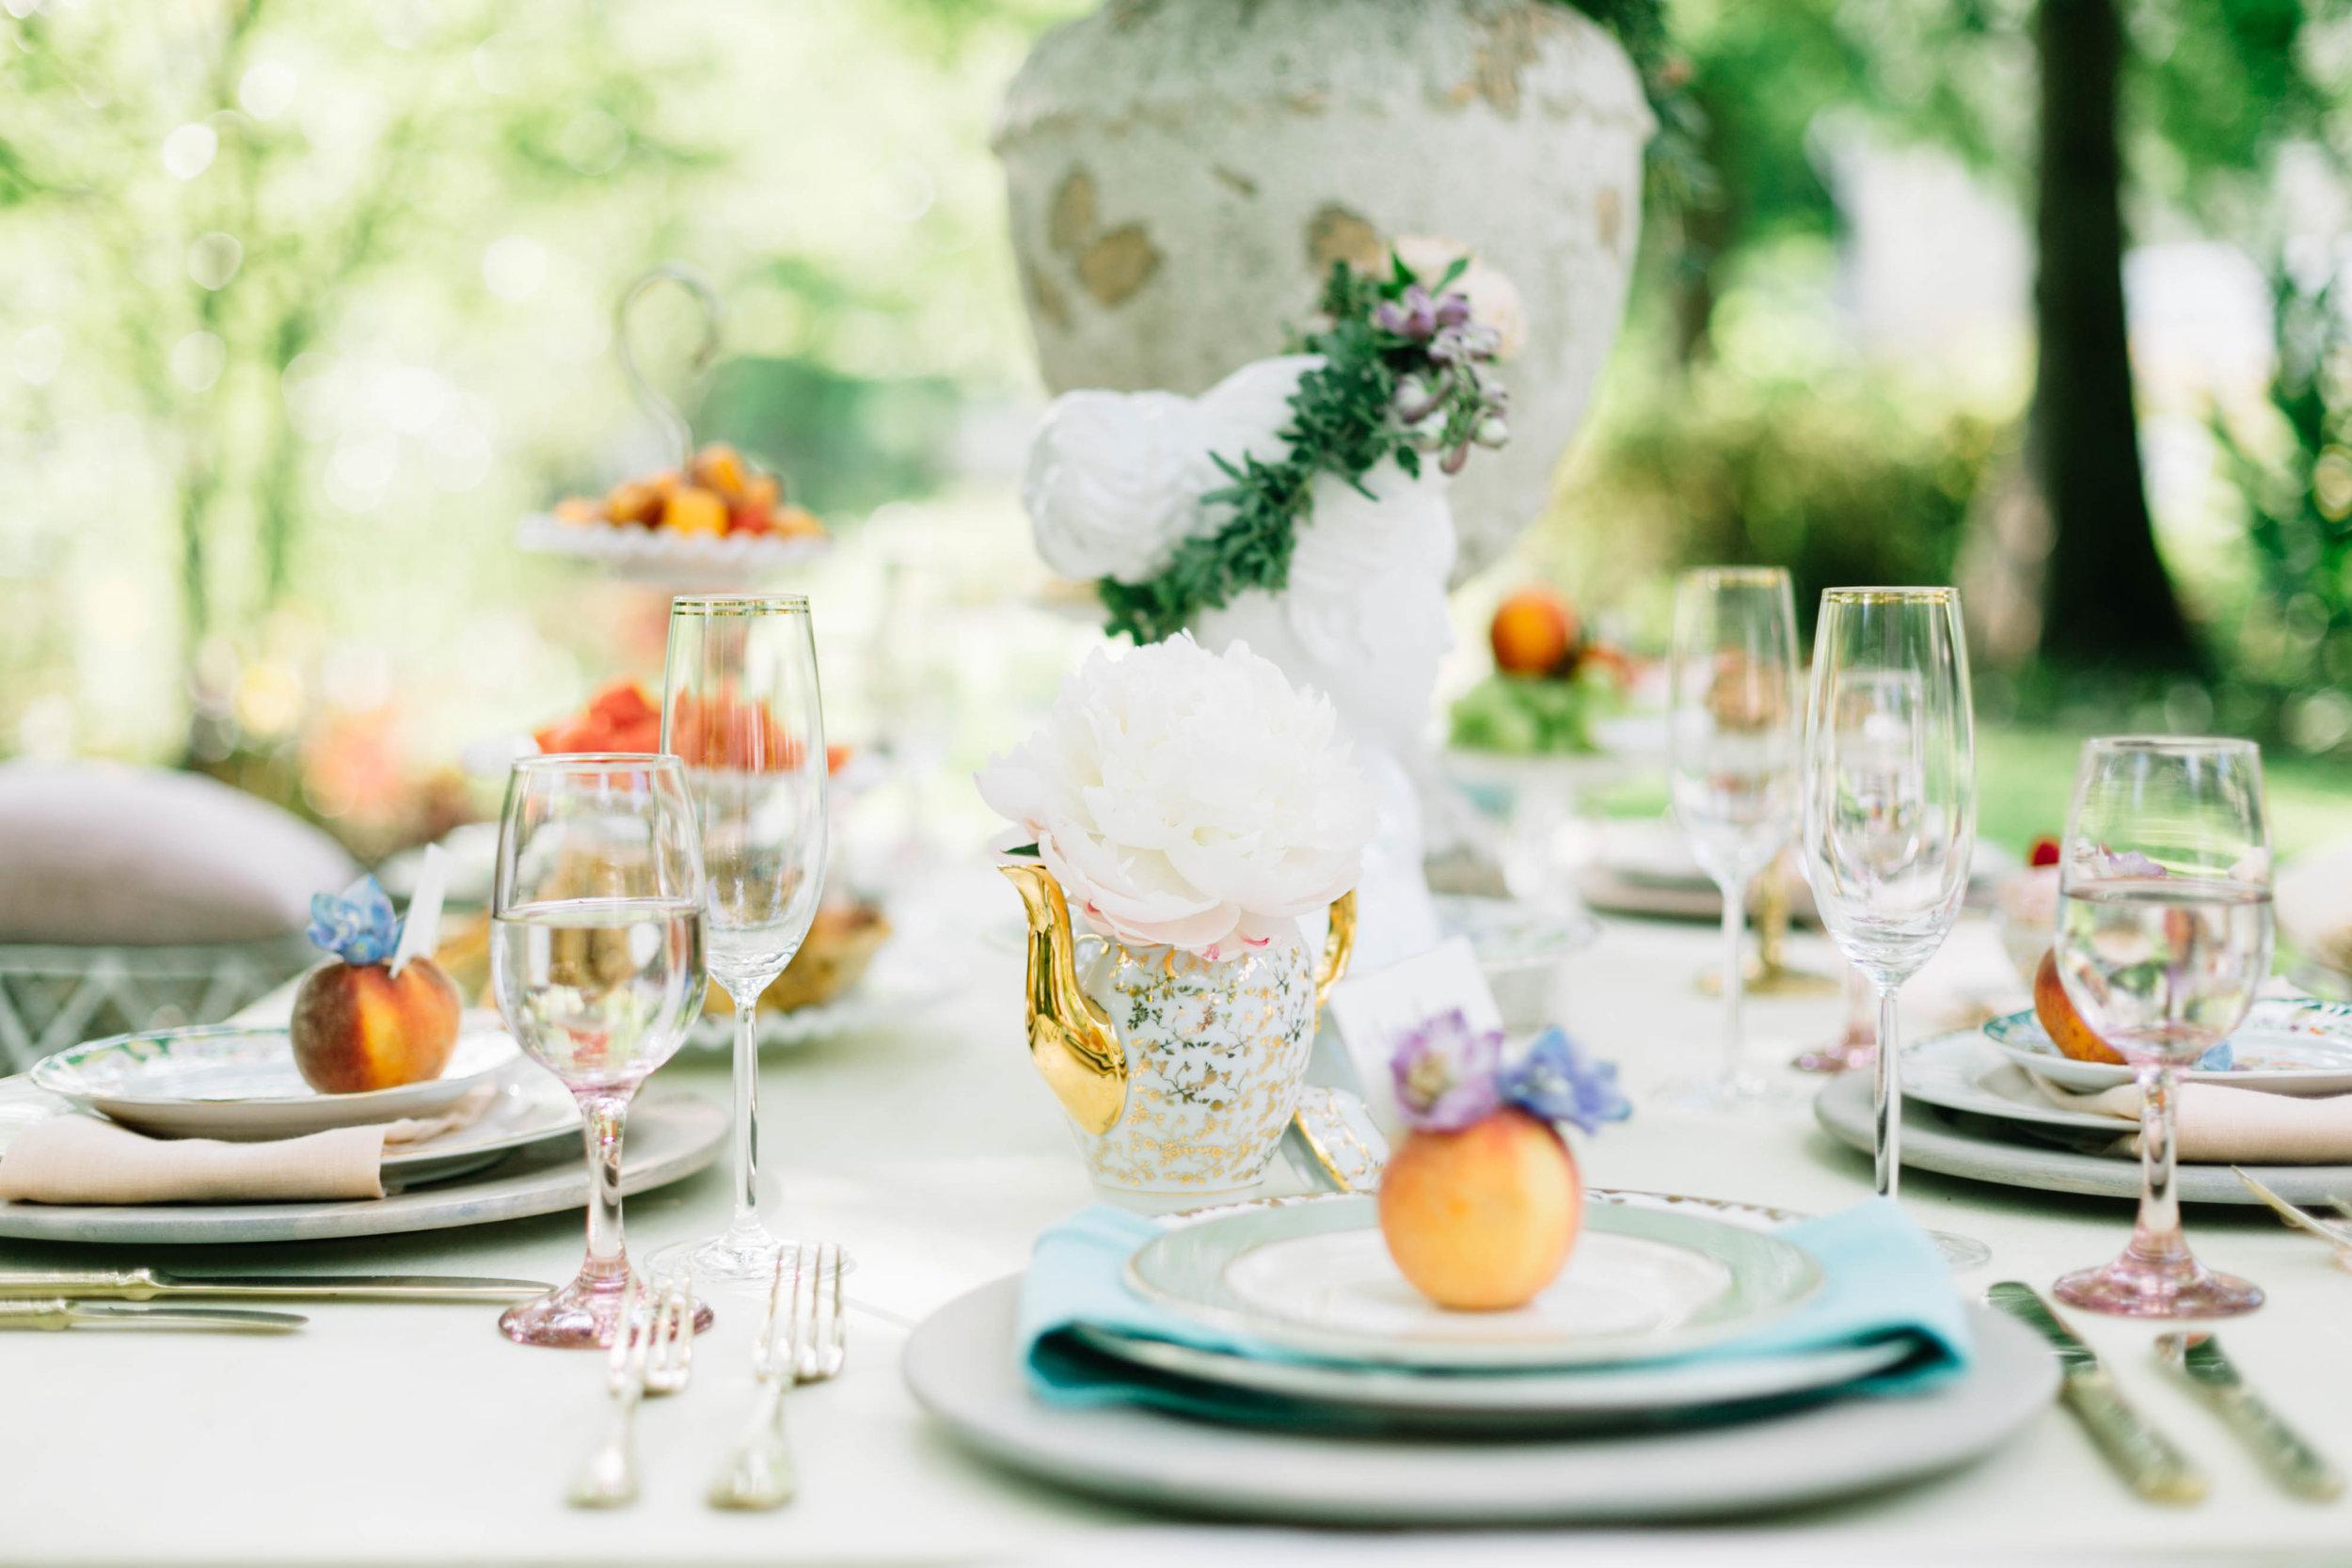 cypress gardens charleston bridal shower wedding planners (52).jpg